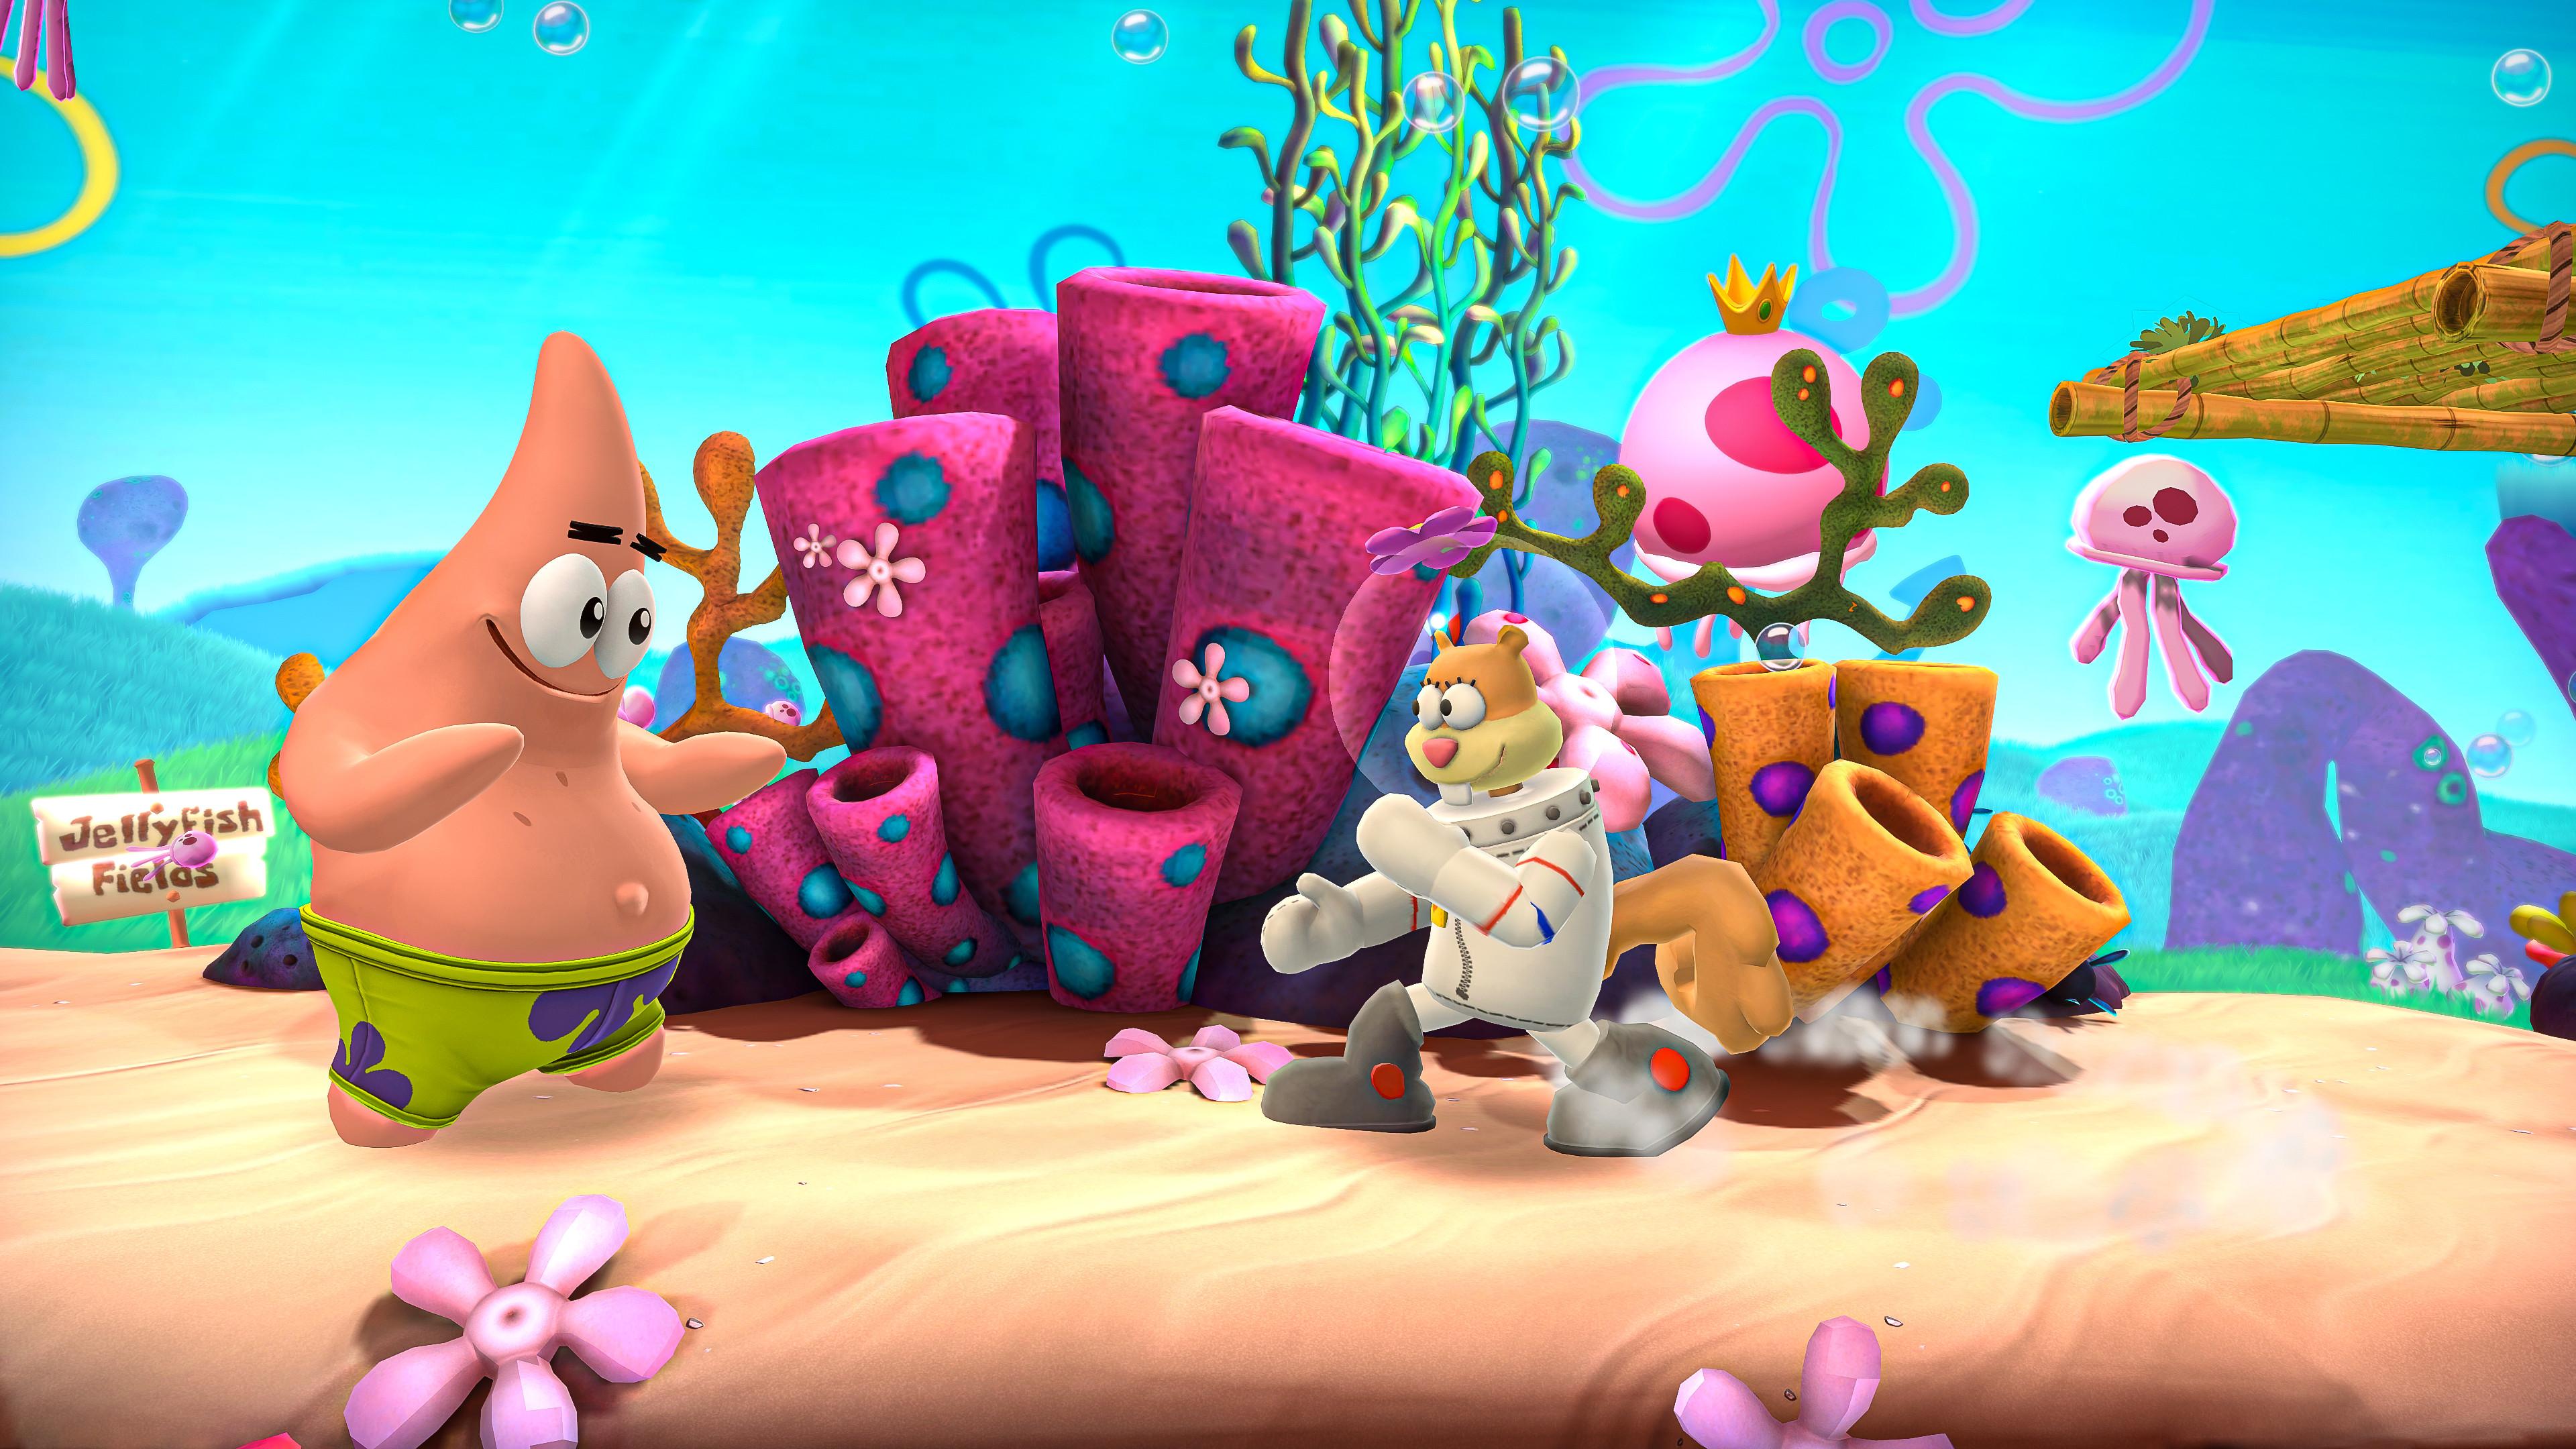 Мультяшки бьют друг другу мордашки — релизный трейлер Nickelodeon All-Star Brawl